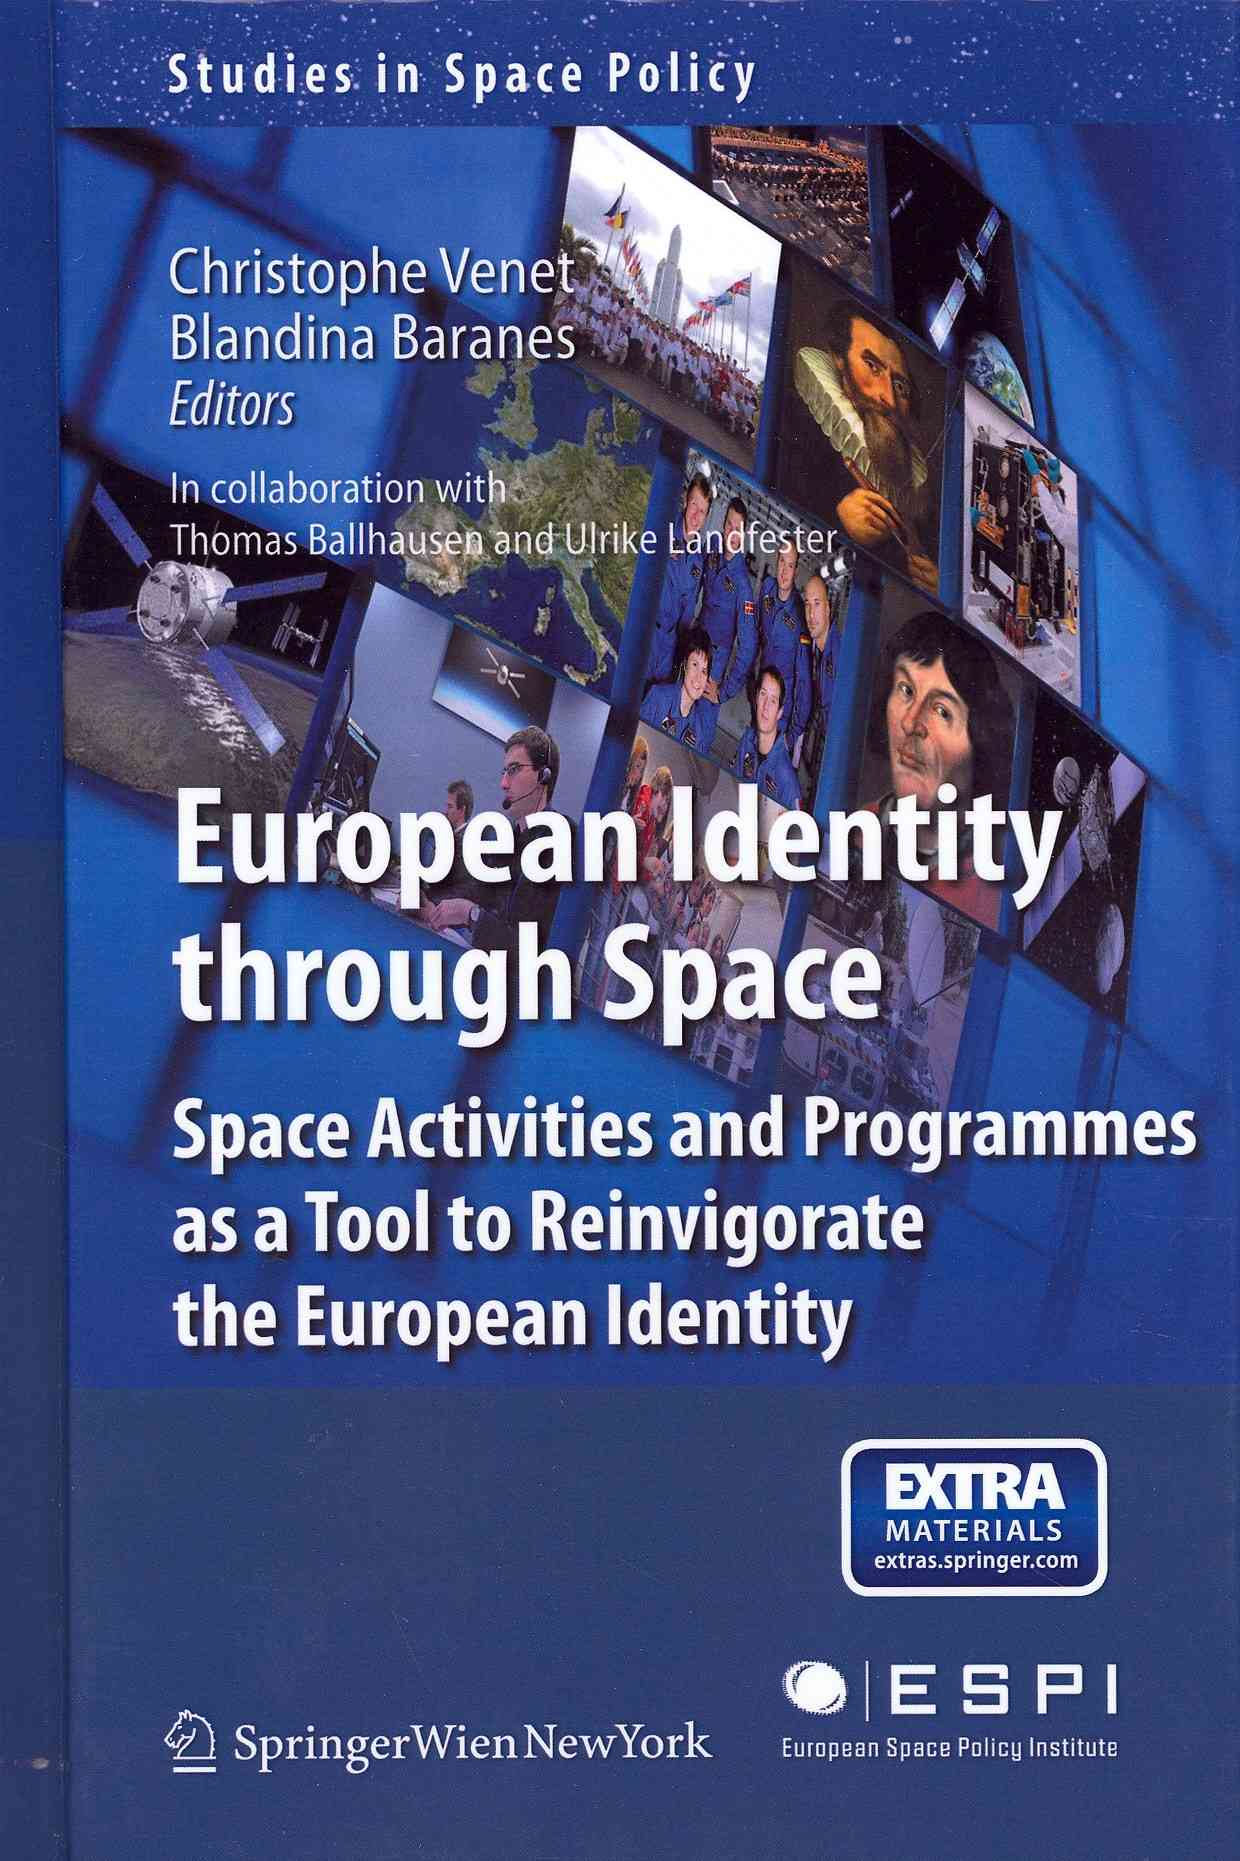 Building European Identity Through a Joint Space Program By Baranes, Blandina (EDT)/ Venet, Christophe (EDT)